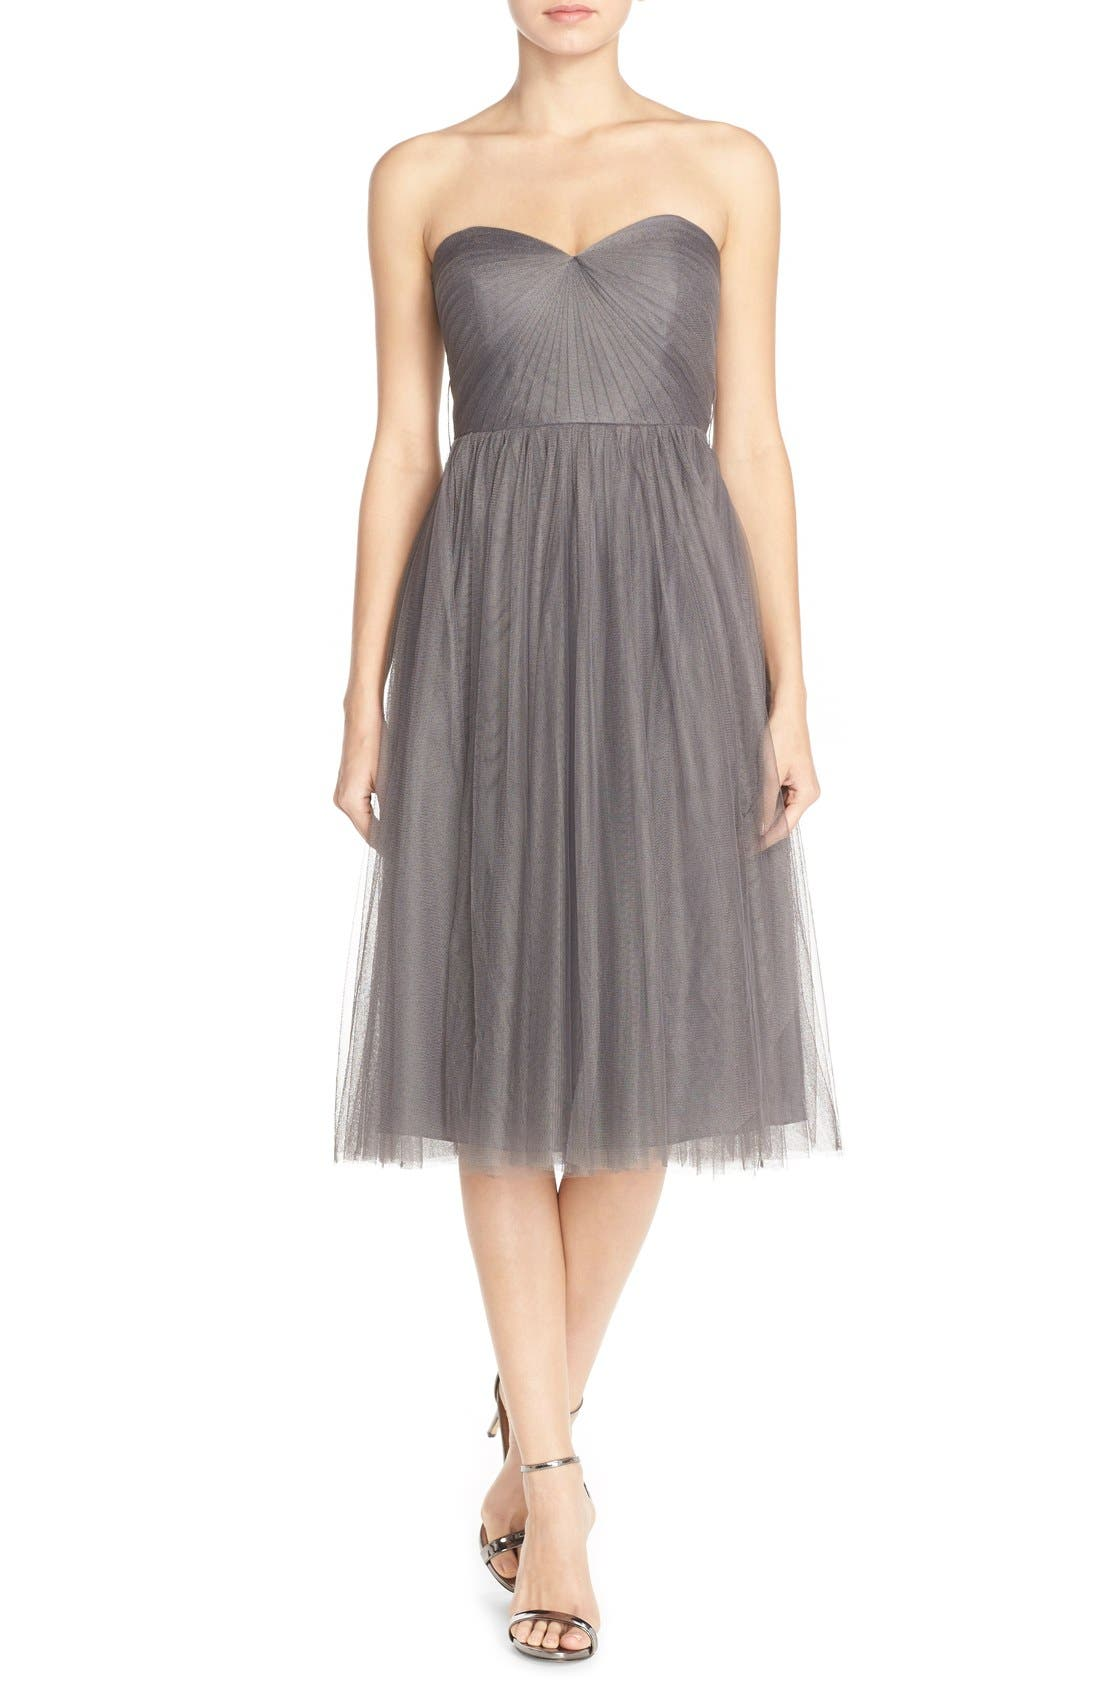 Maia Convertible Tulle Tea Length Fit & Flare Dress,                         Main,                         color, 028